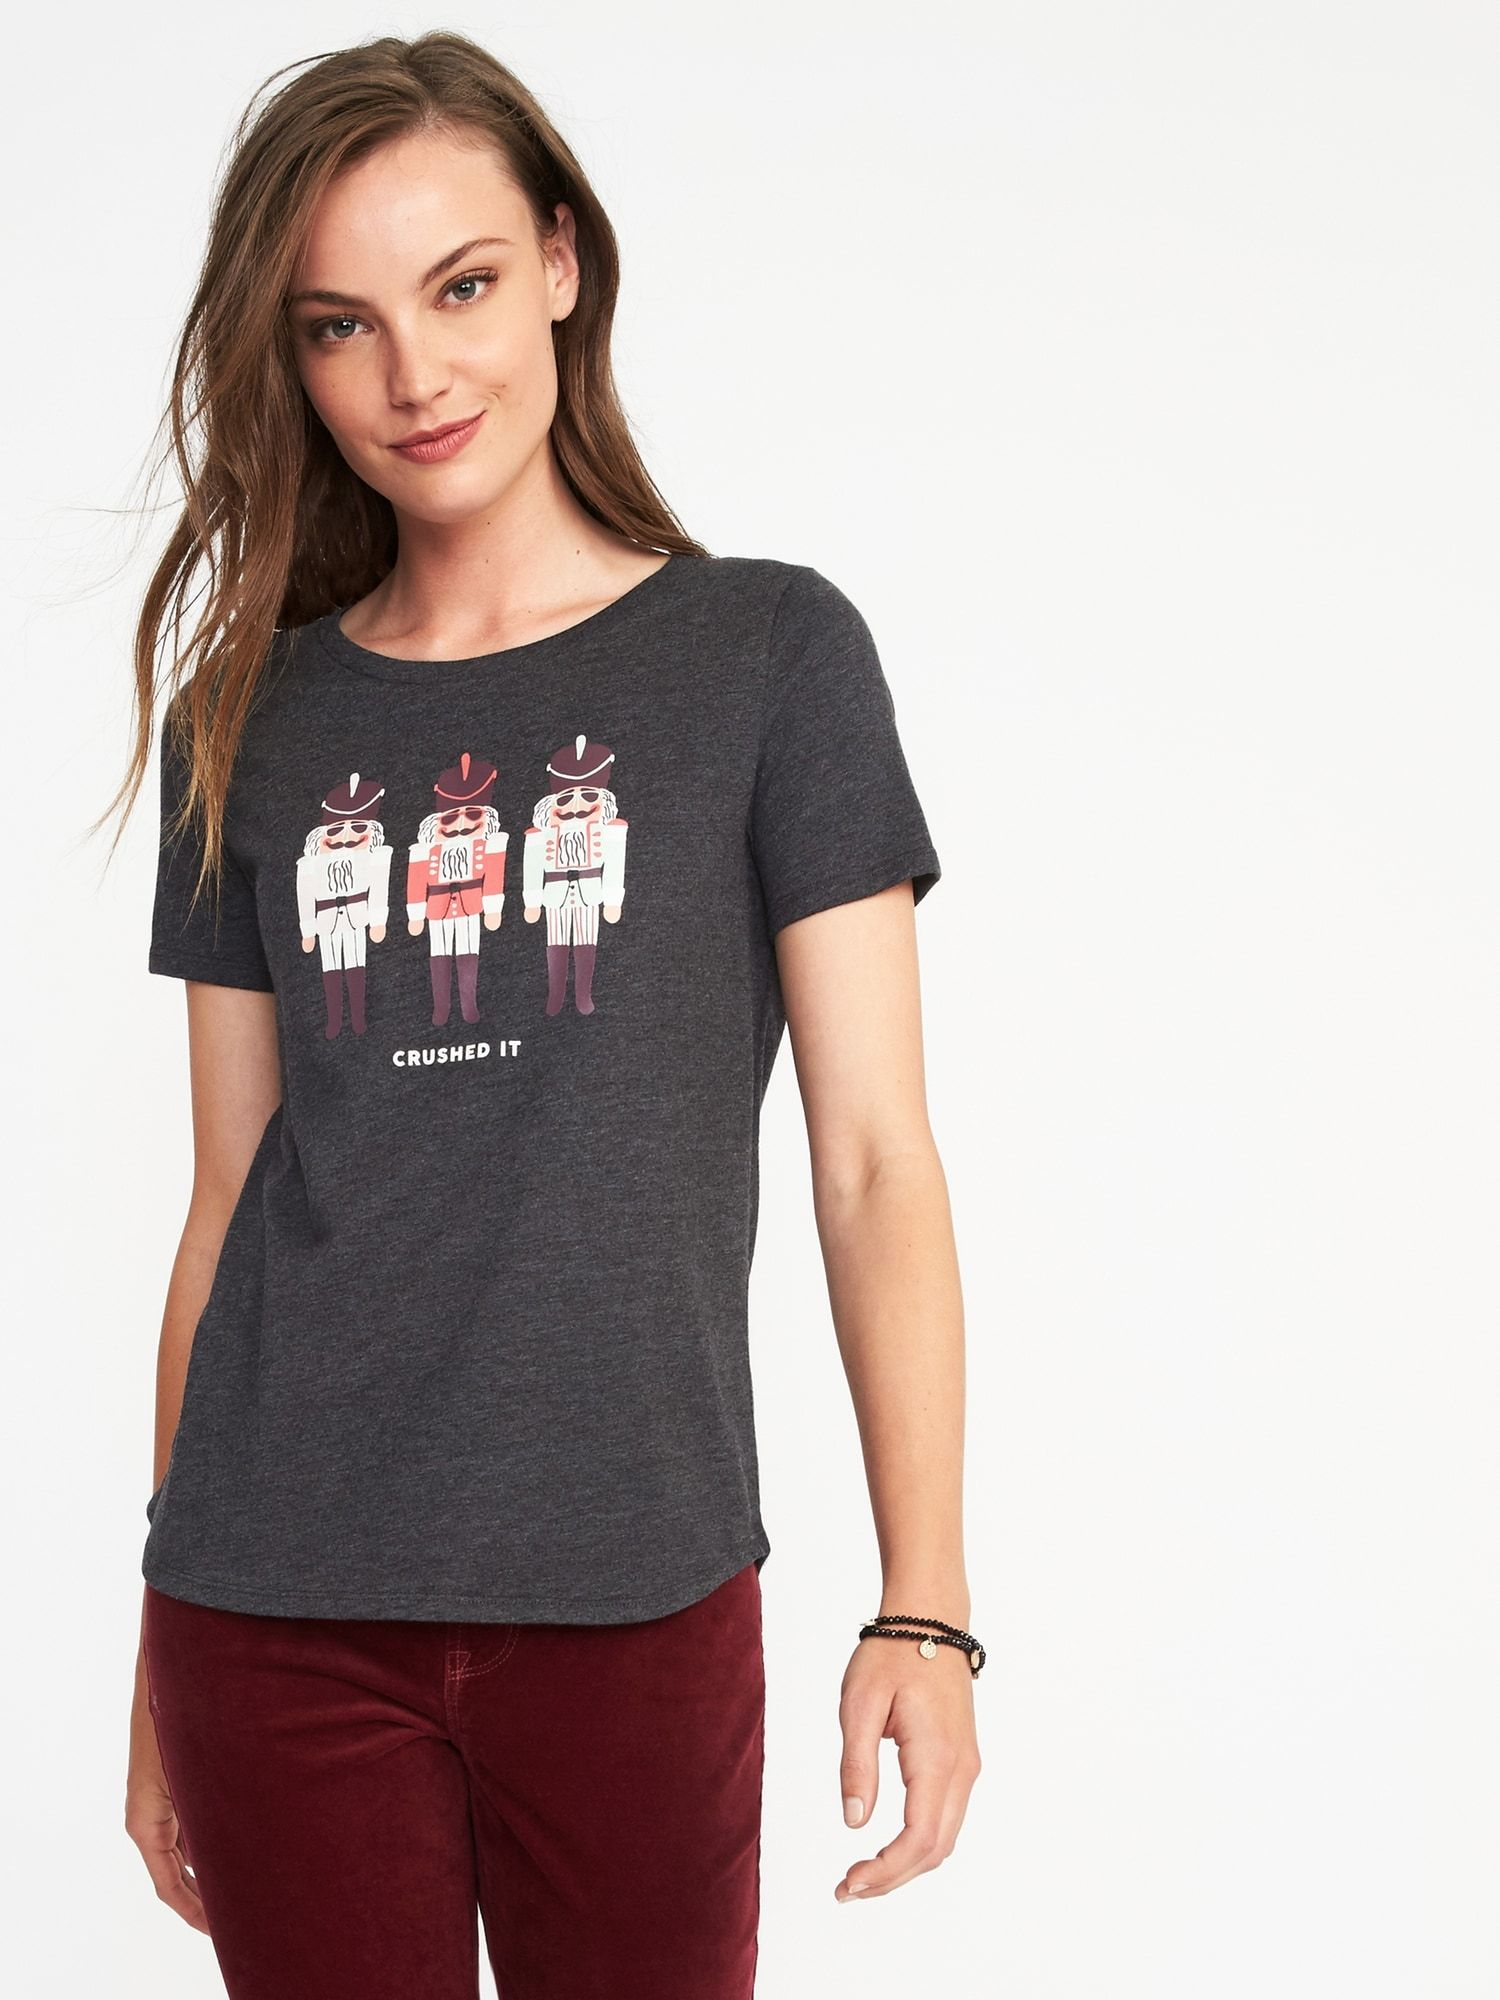 Old Navy Womens Christmas Shirts | Lauren Goss